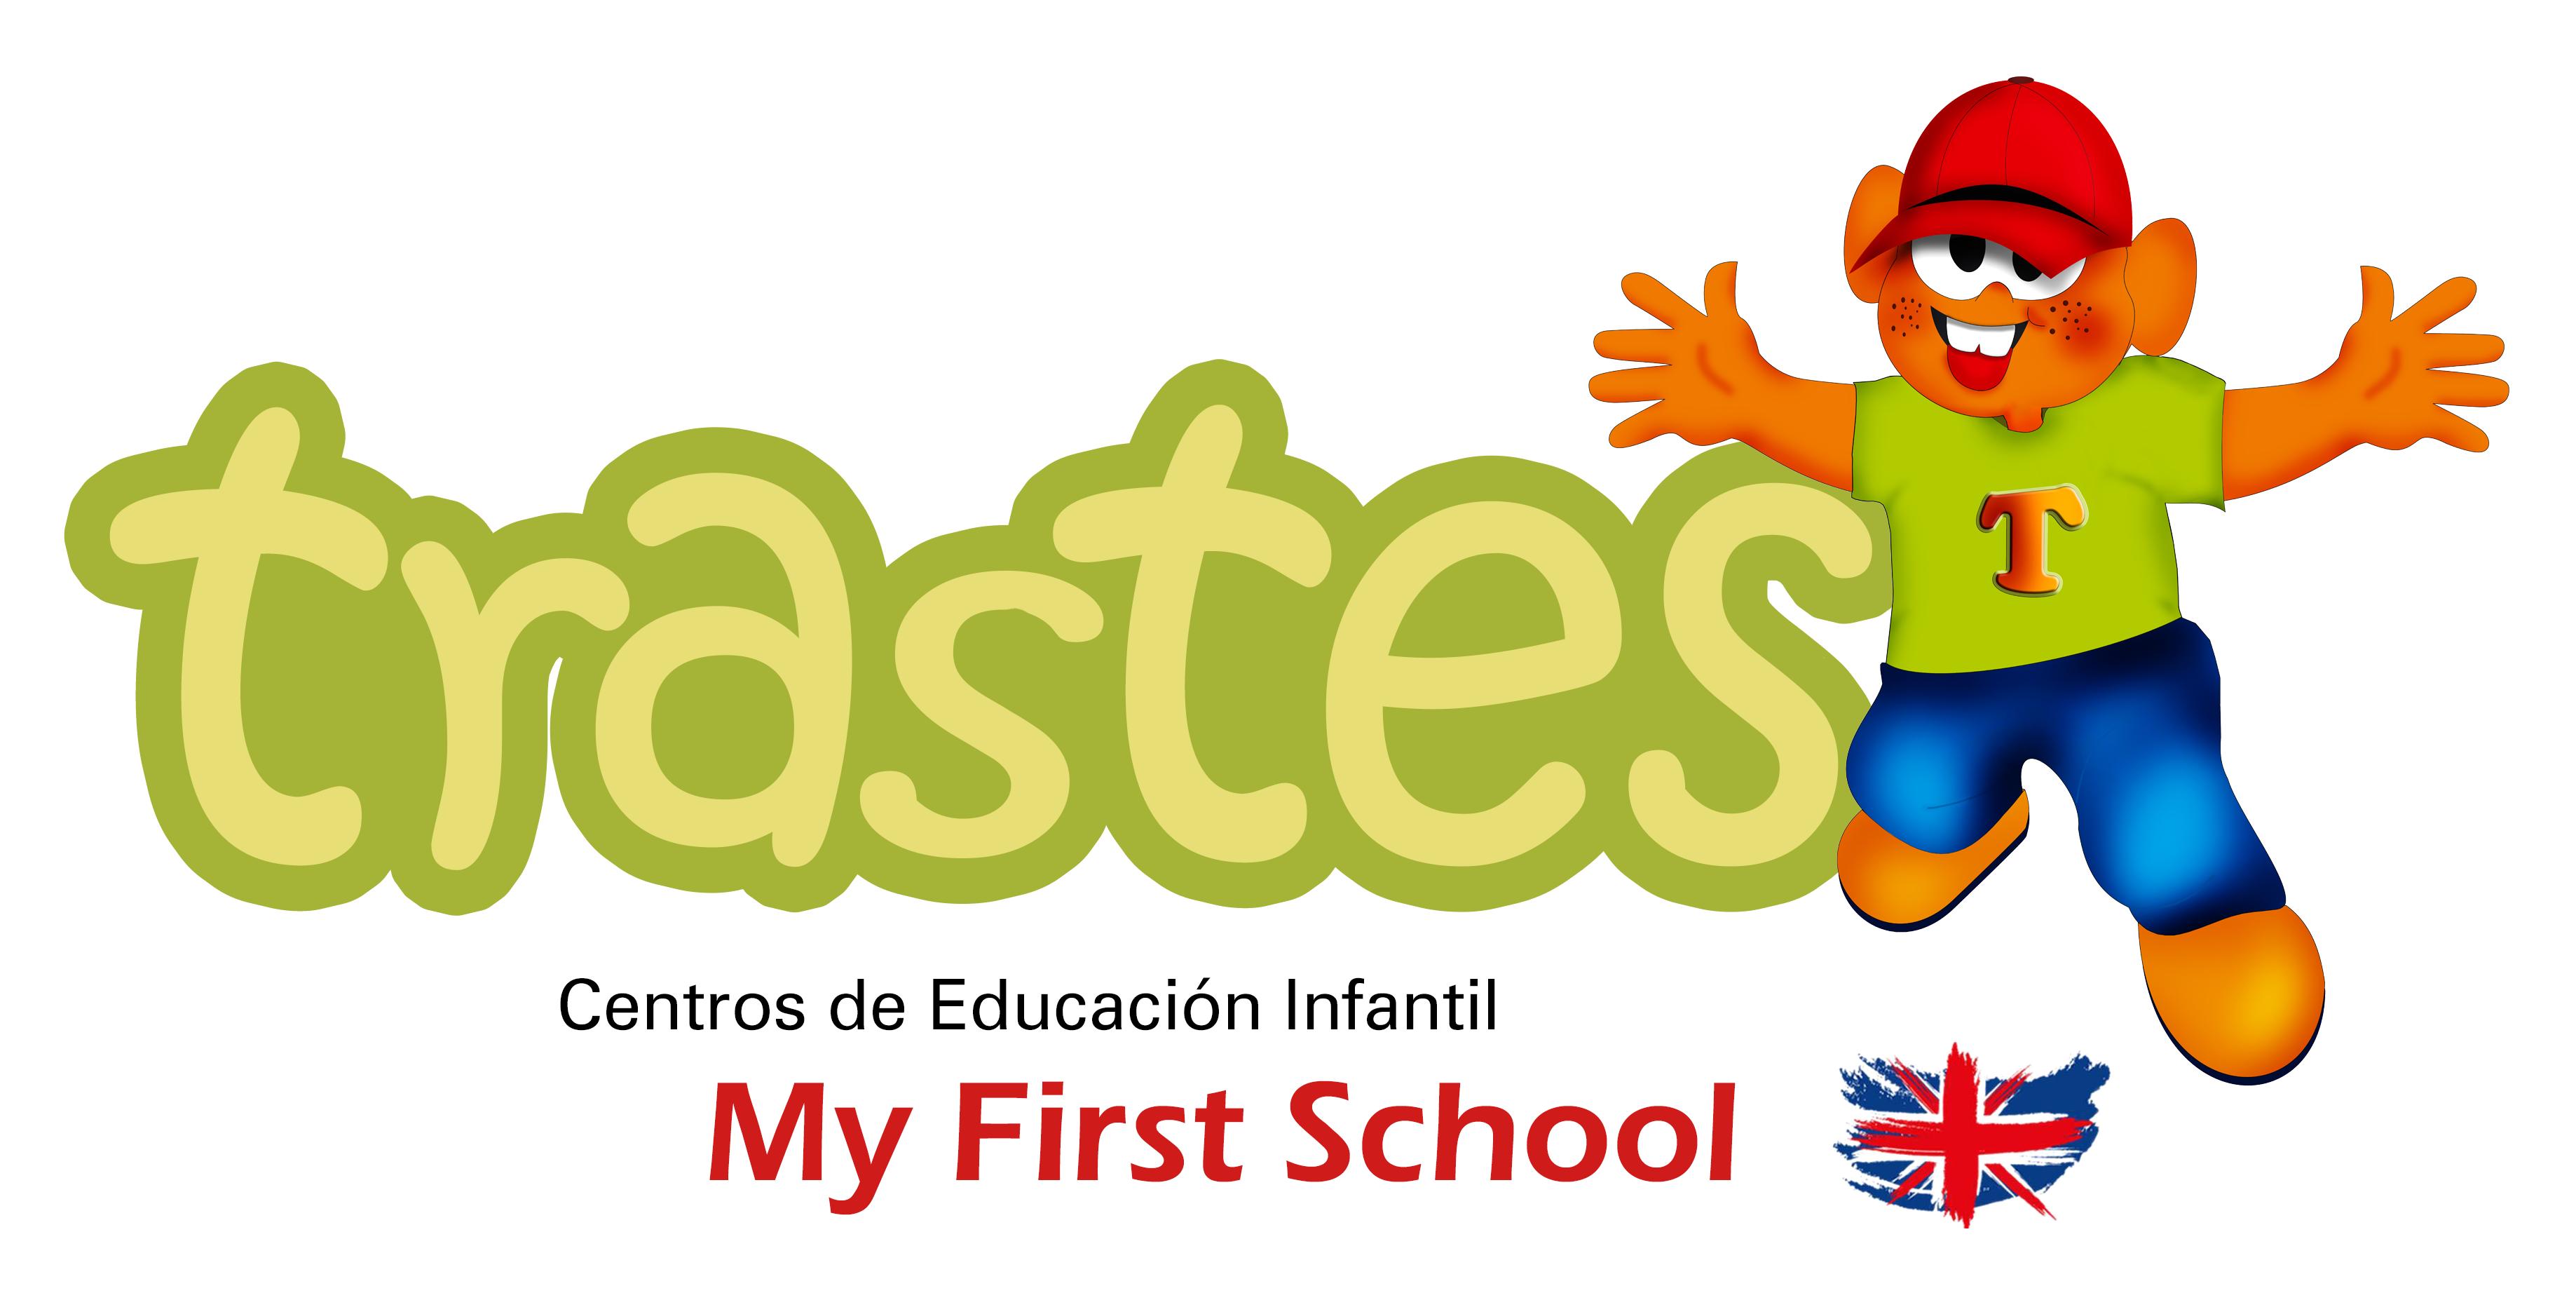 Trastes Centros de Educación Infantil